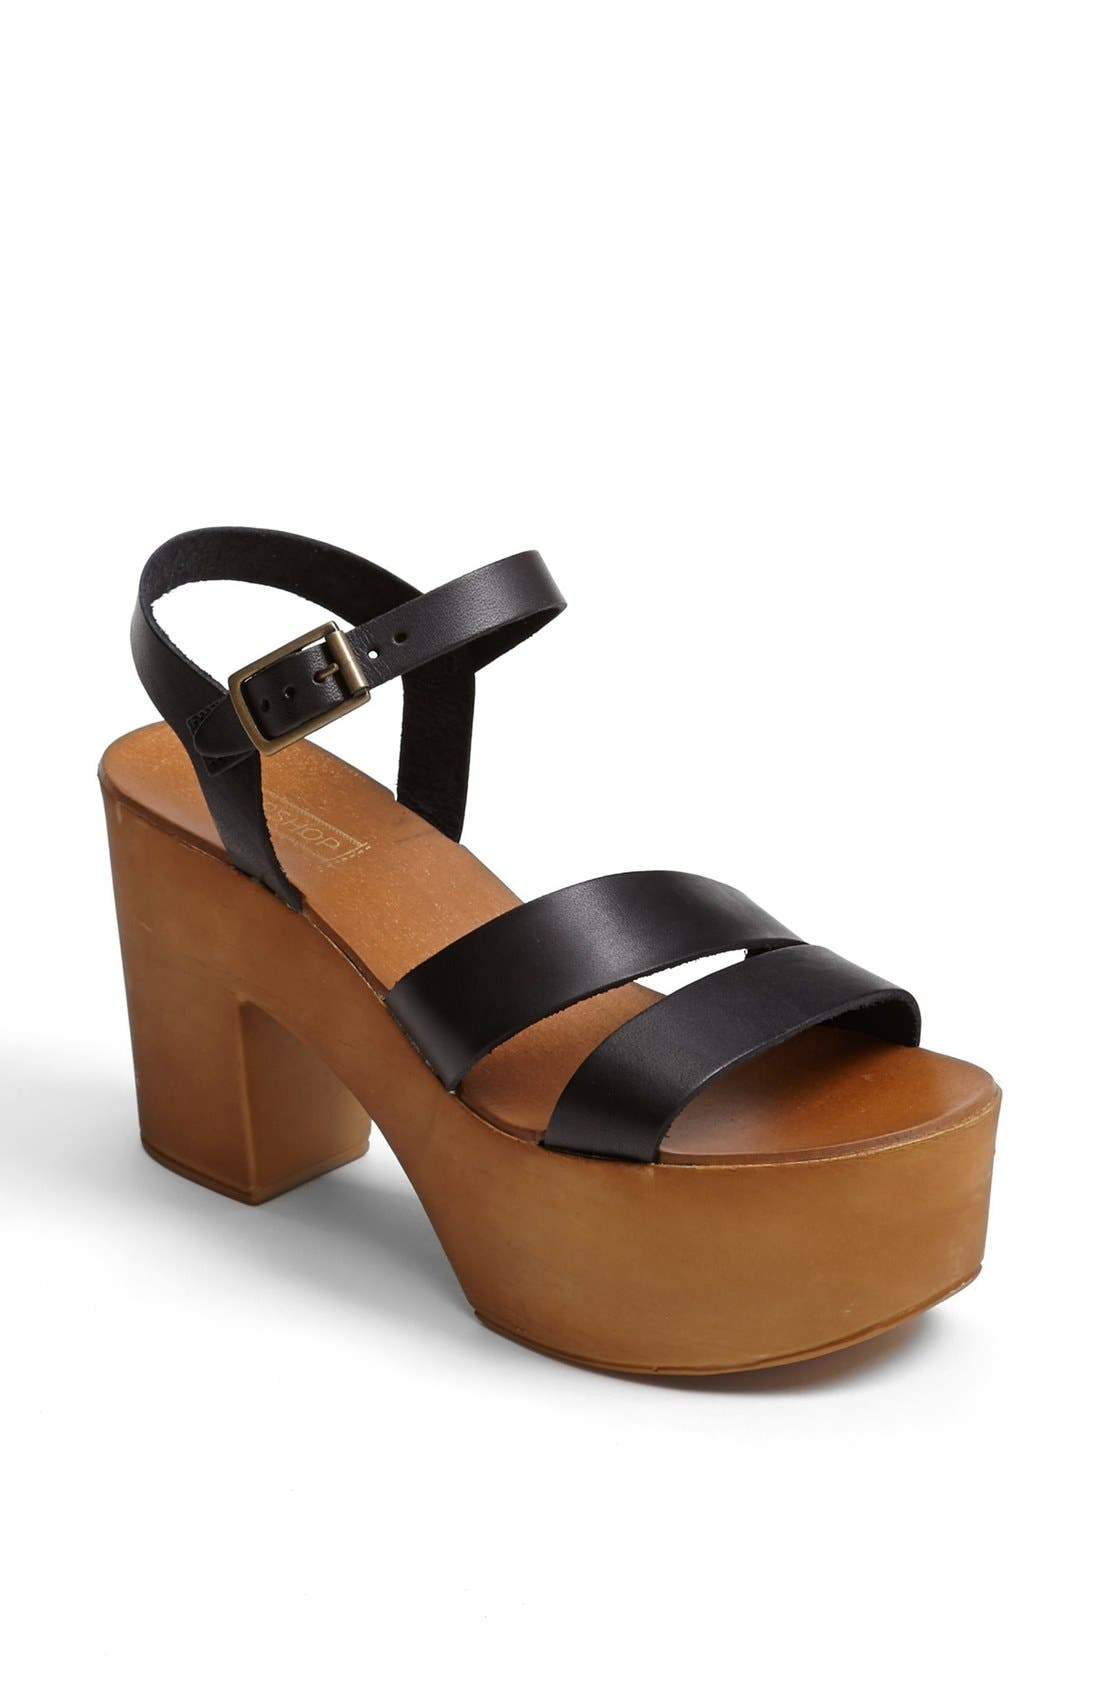 Main Image - Topshop 'Nelson' Platform Sandal